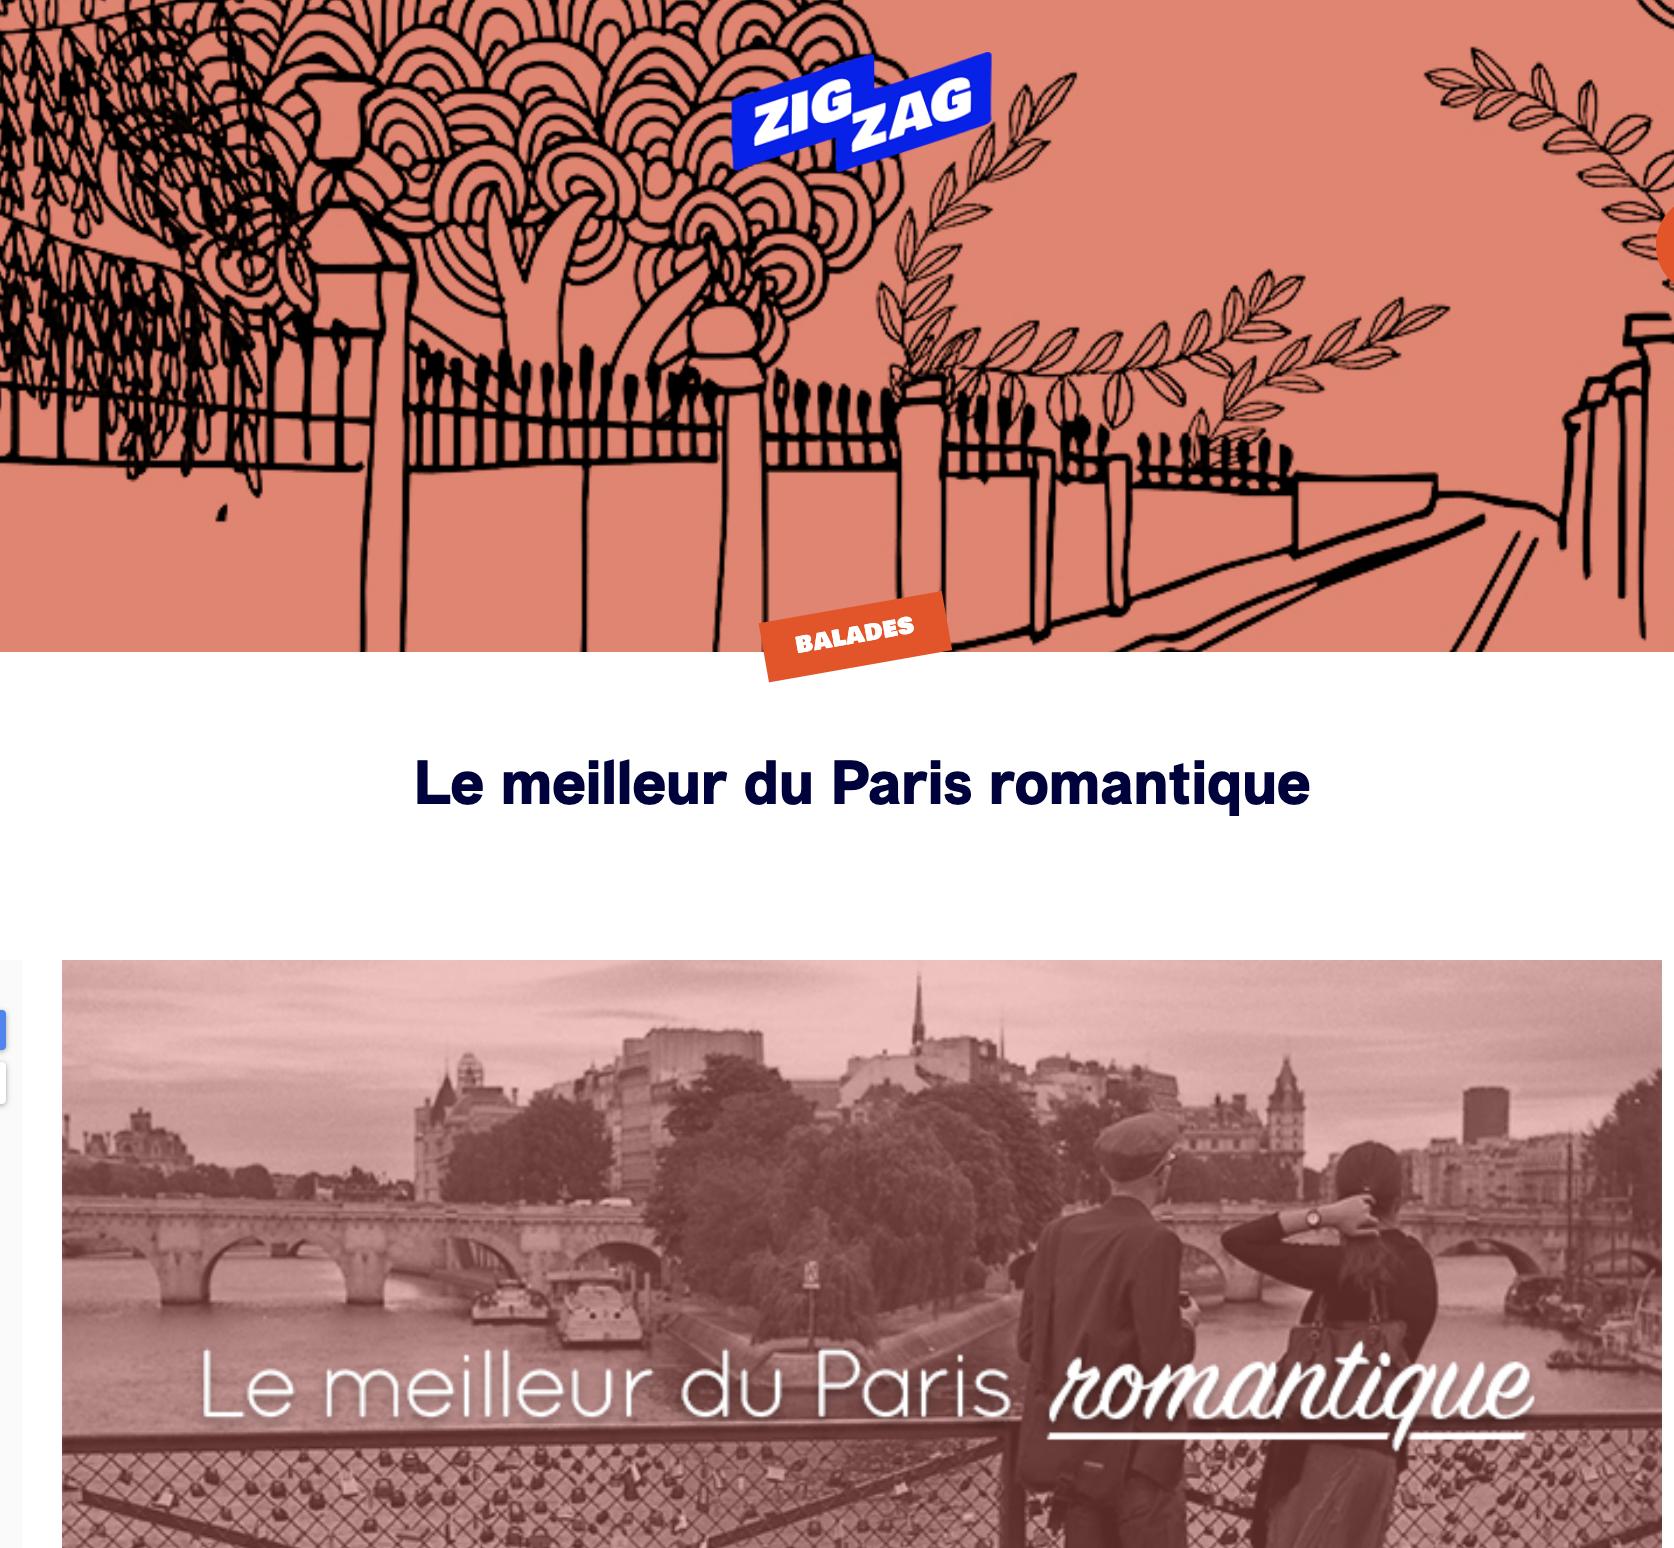 balades excusions paris romantique Paris ZIg Zag